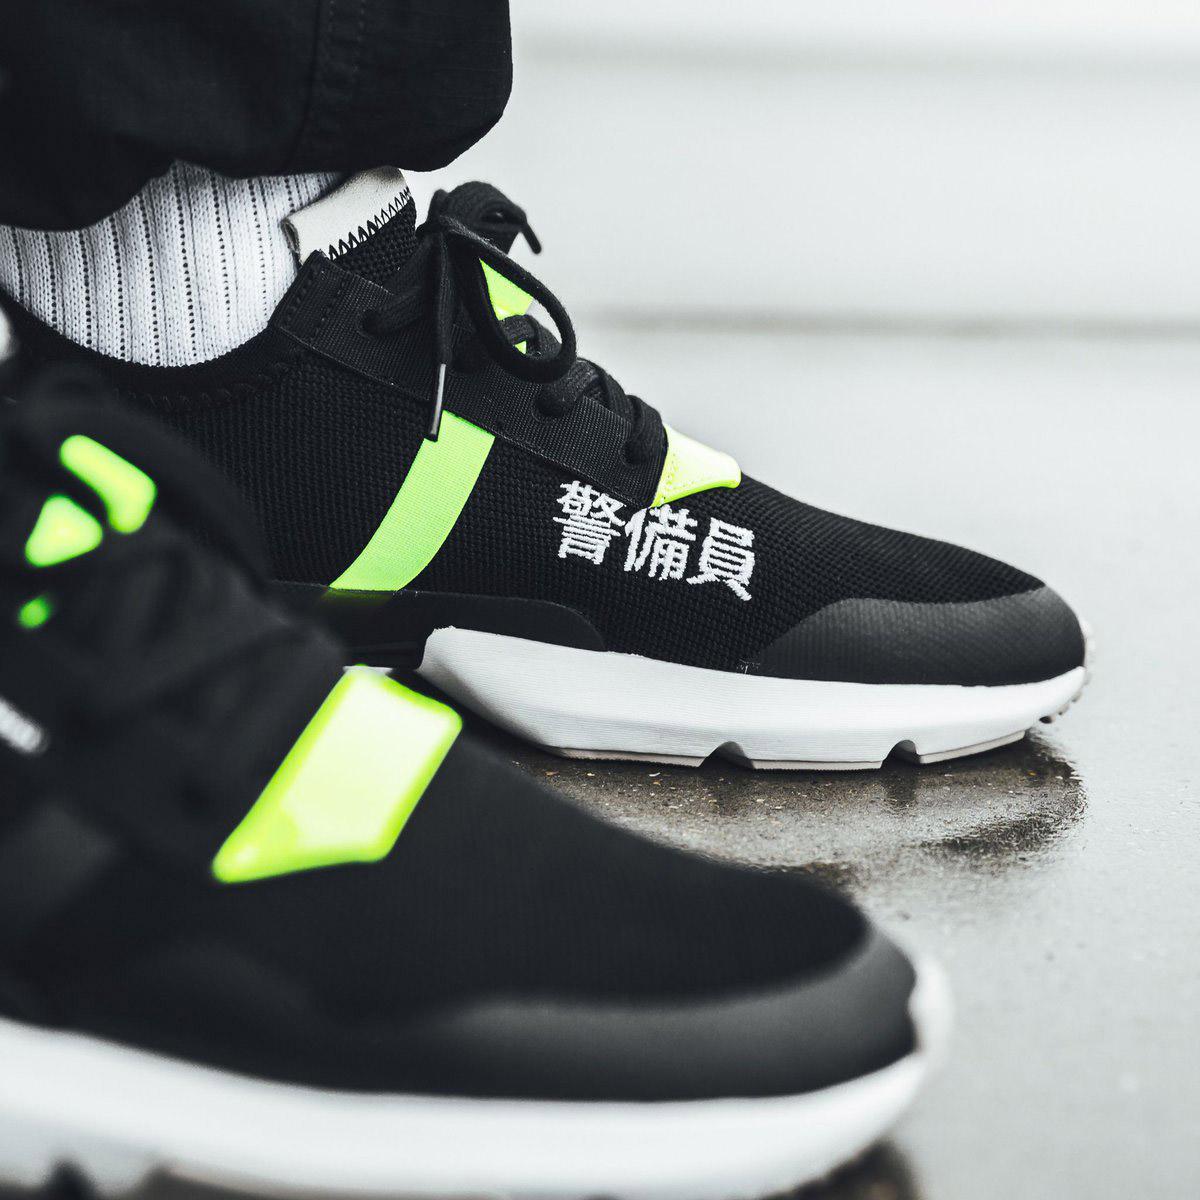 NEW adidas Originals POD-S3.1 - Traffic